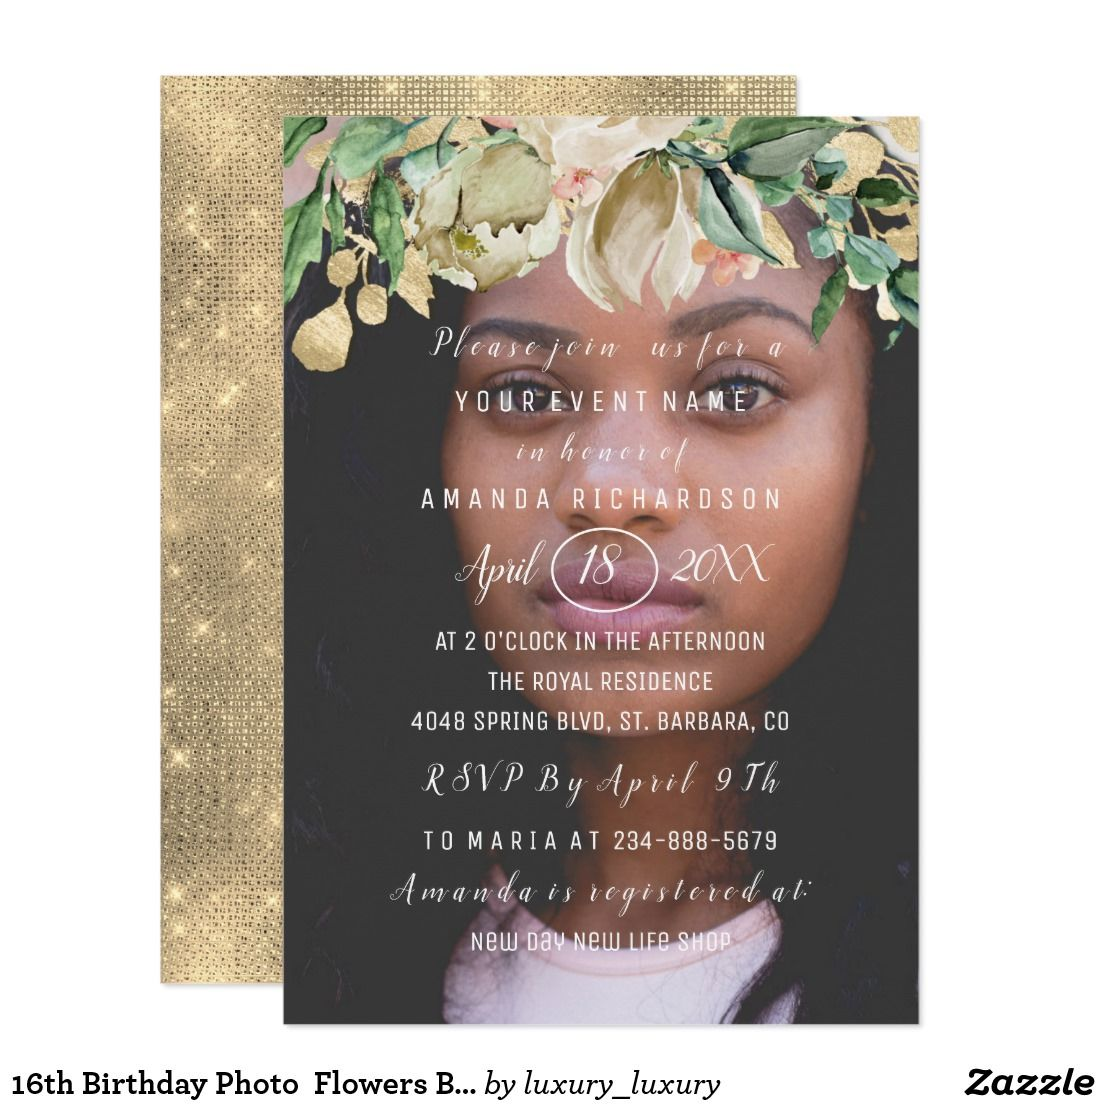 16th Birthday Photo Flowers Brunch Spark Gold Invitation